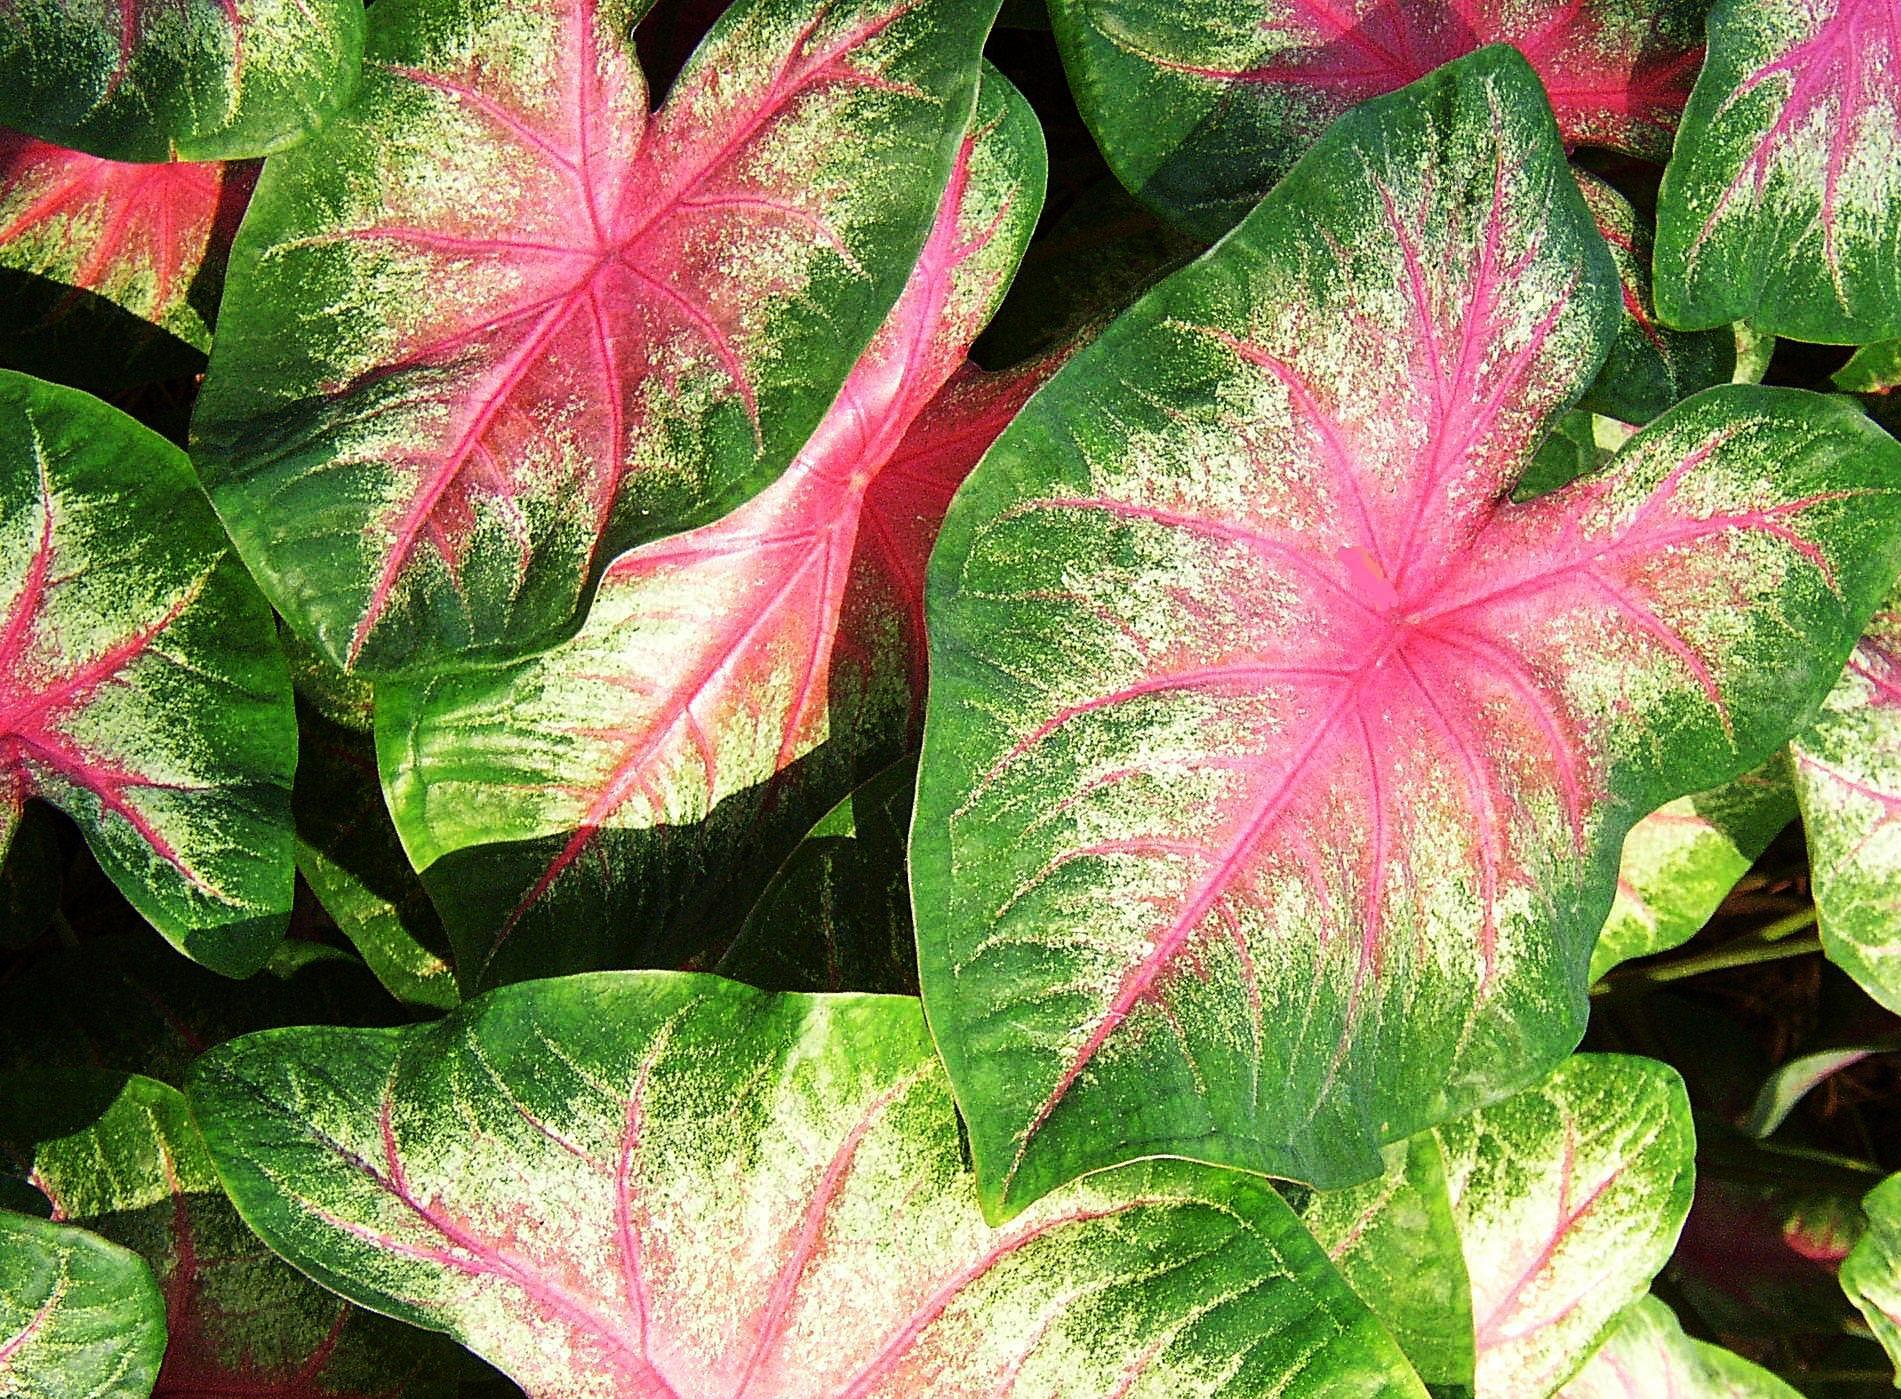 Elephant ear plant variegated pink pics4learning elephant ear plant variegated pink mightylinksfo